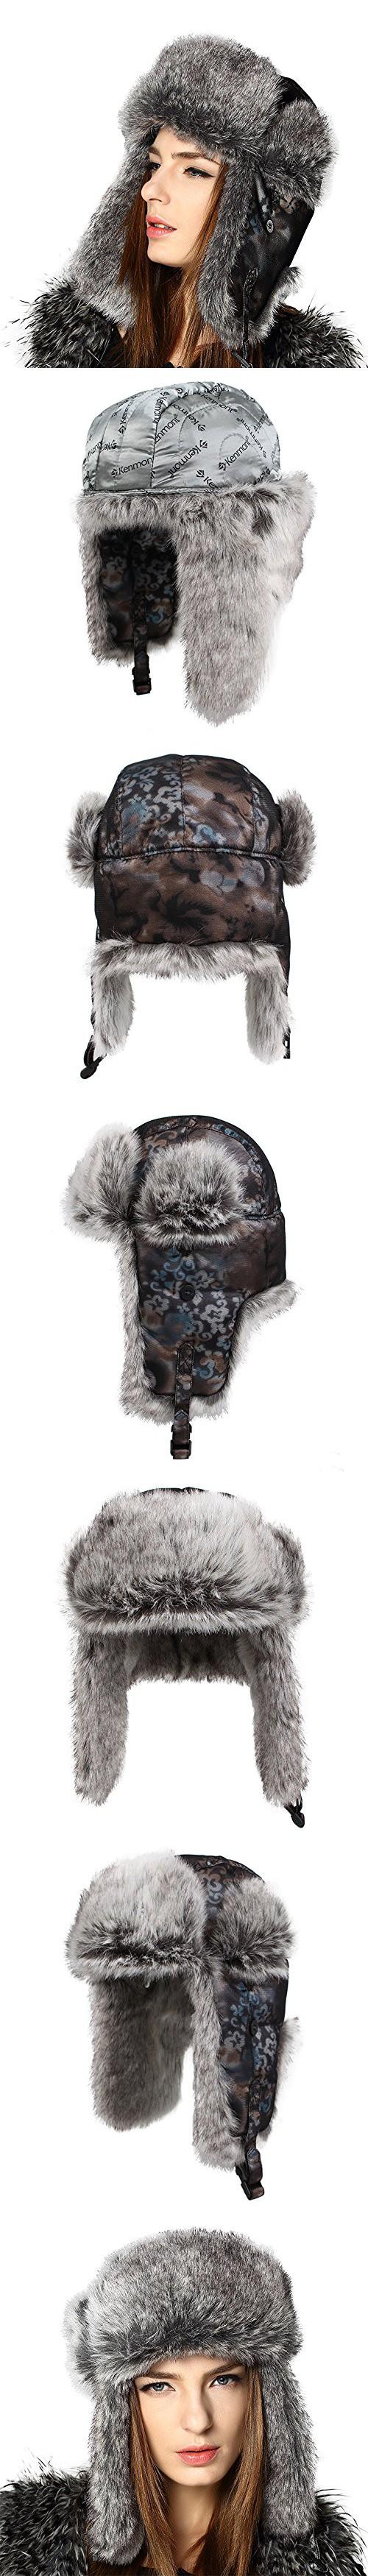 7dc683b7a26 Kenmont Women Lady Winter Warm Ski Outdoor Faux Fur Aviator Trapper Hat  Bomber Cap